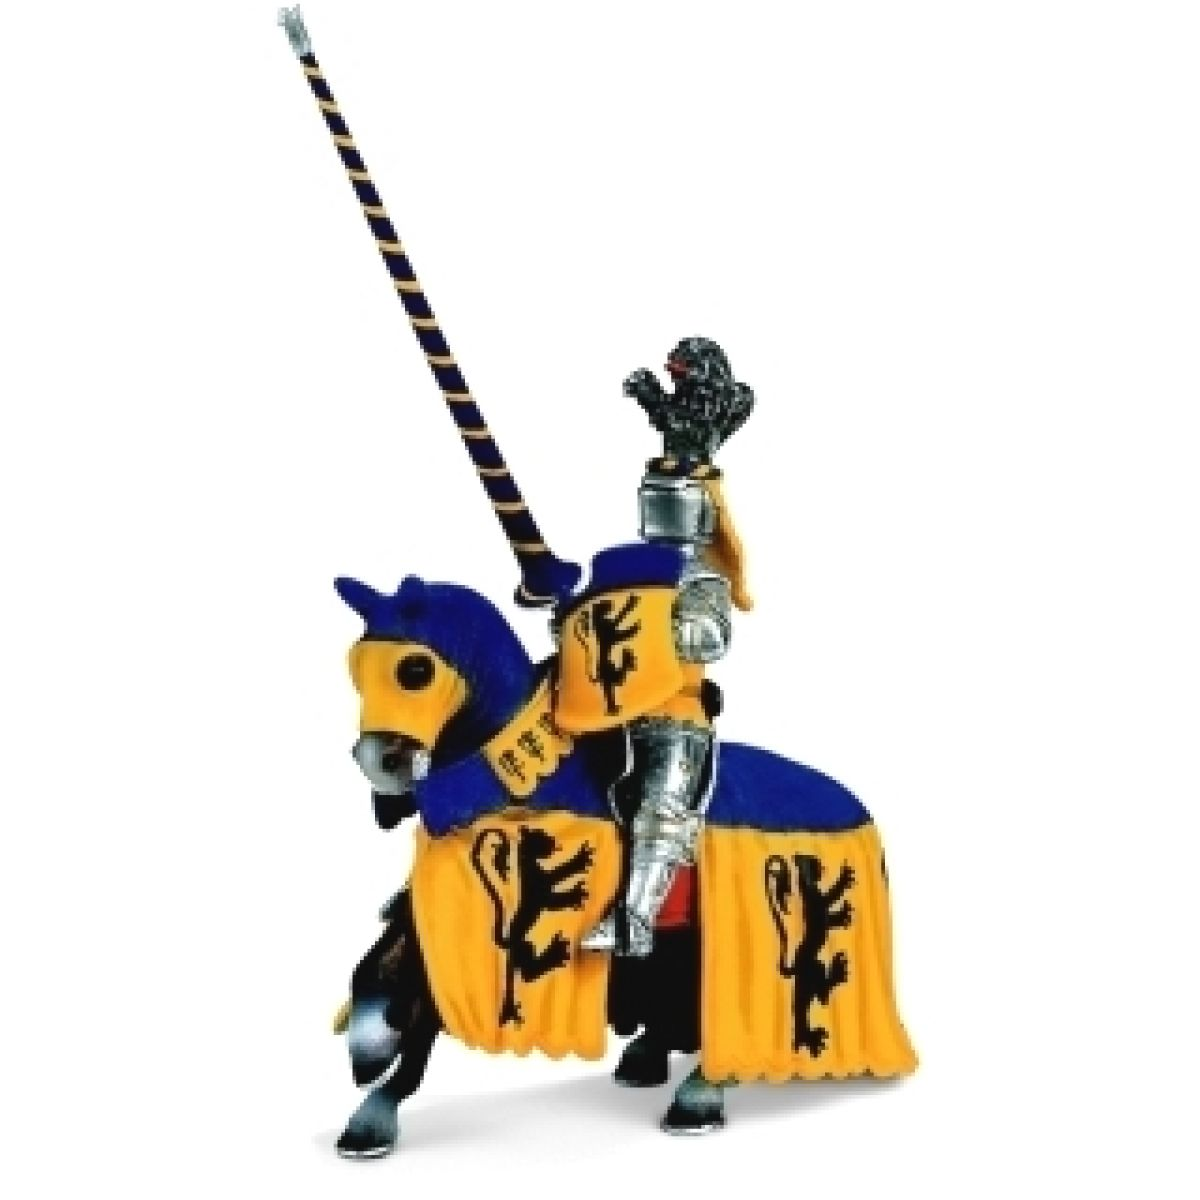 Schleich Rytíř na koni - modrožlutý